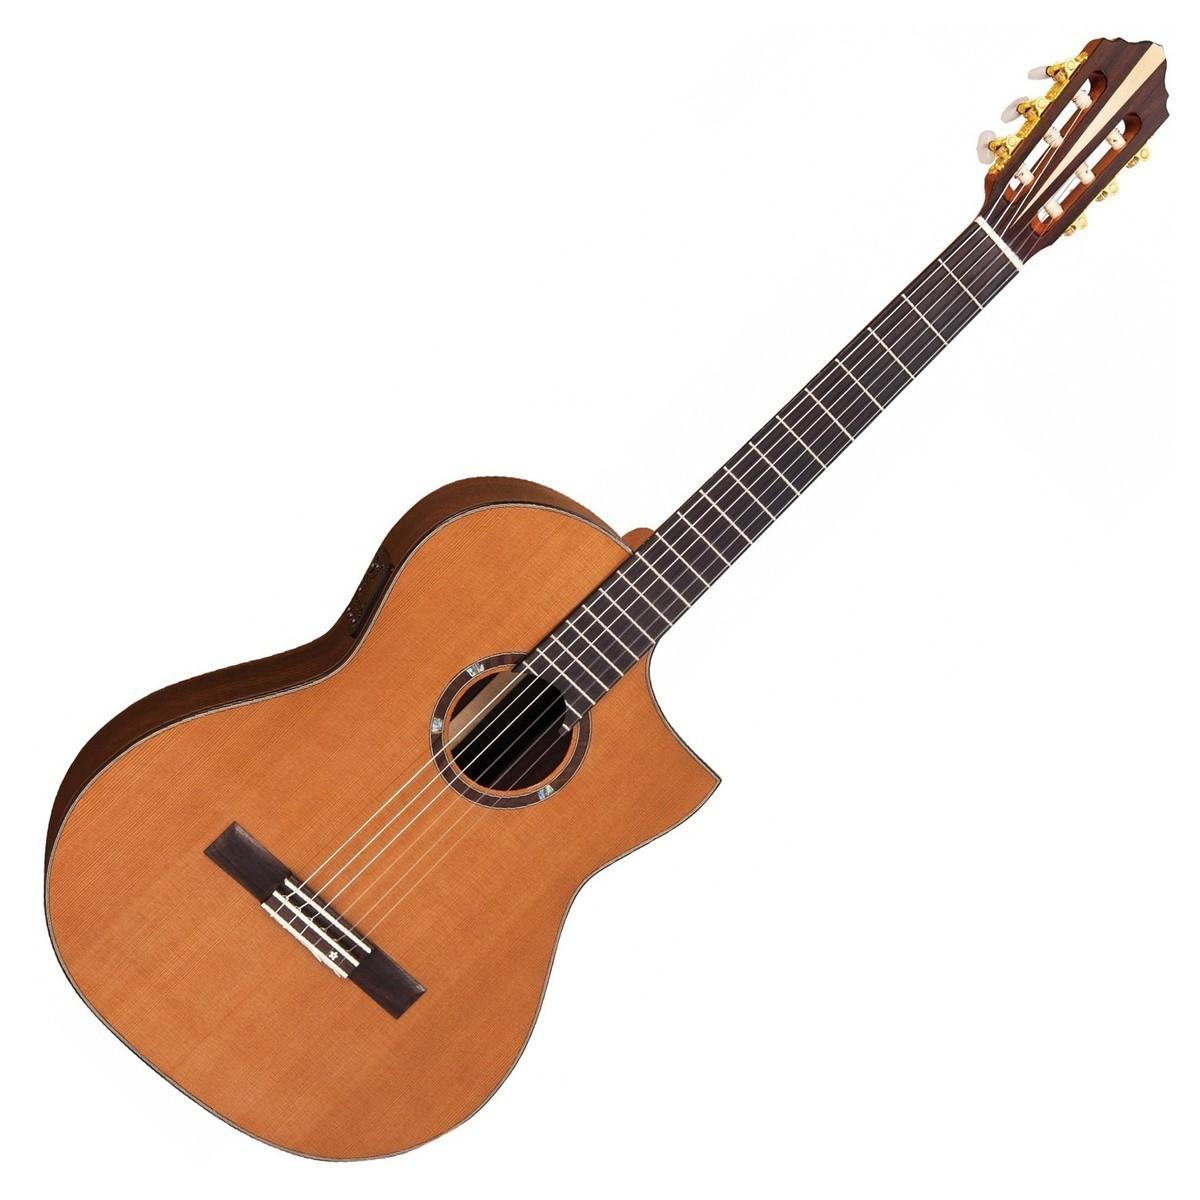 vintage roger williams nylon electro acoustic crossover guitar hot rox uk. Black Bedroom Furniture Sets. Home Design Ideas